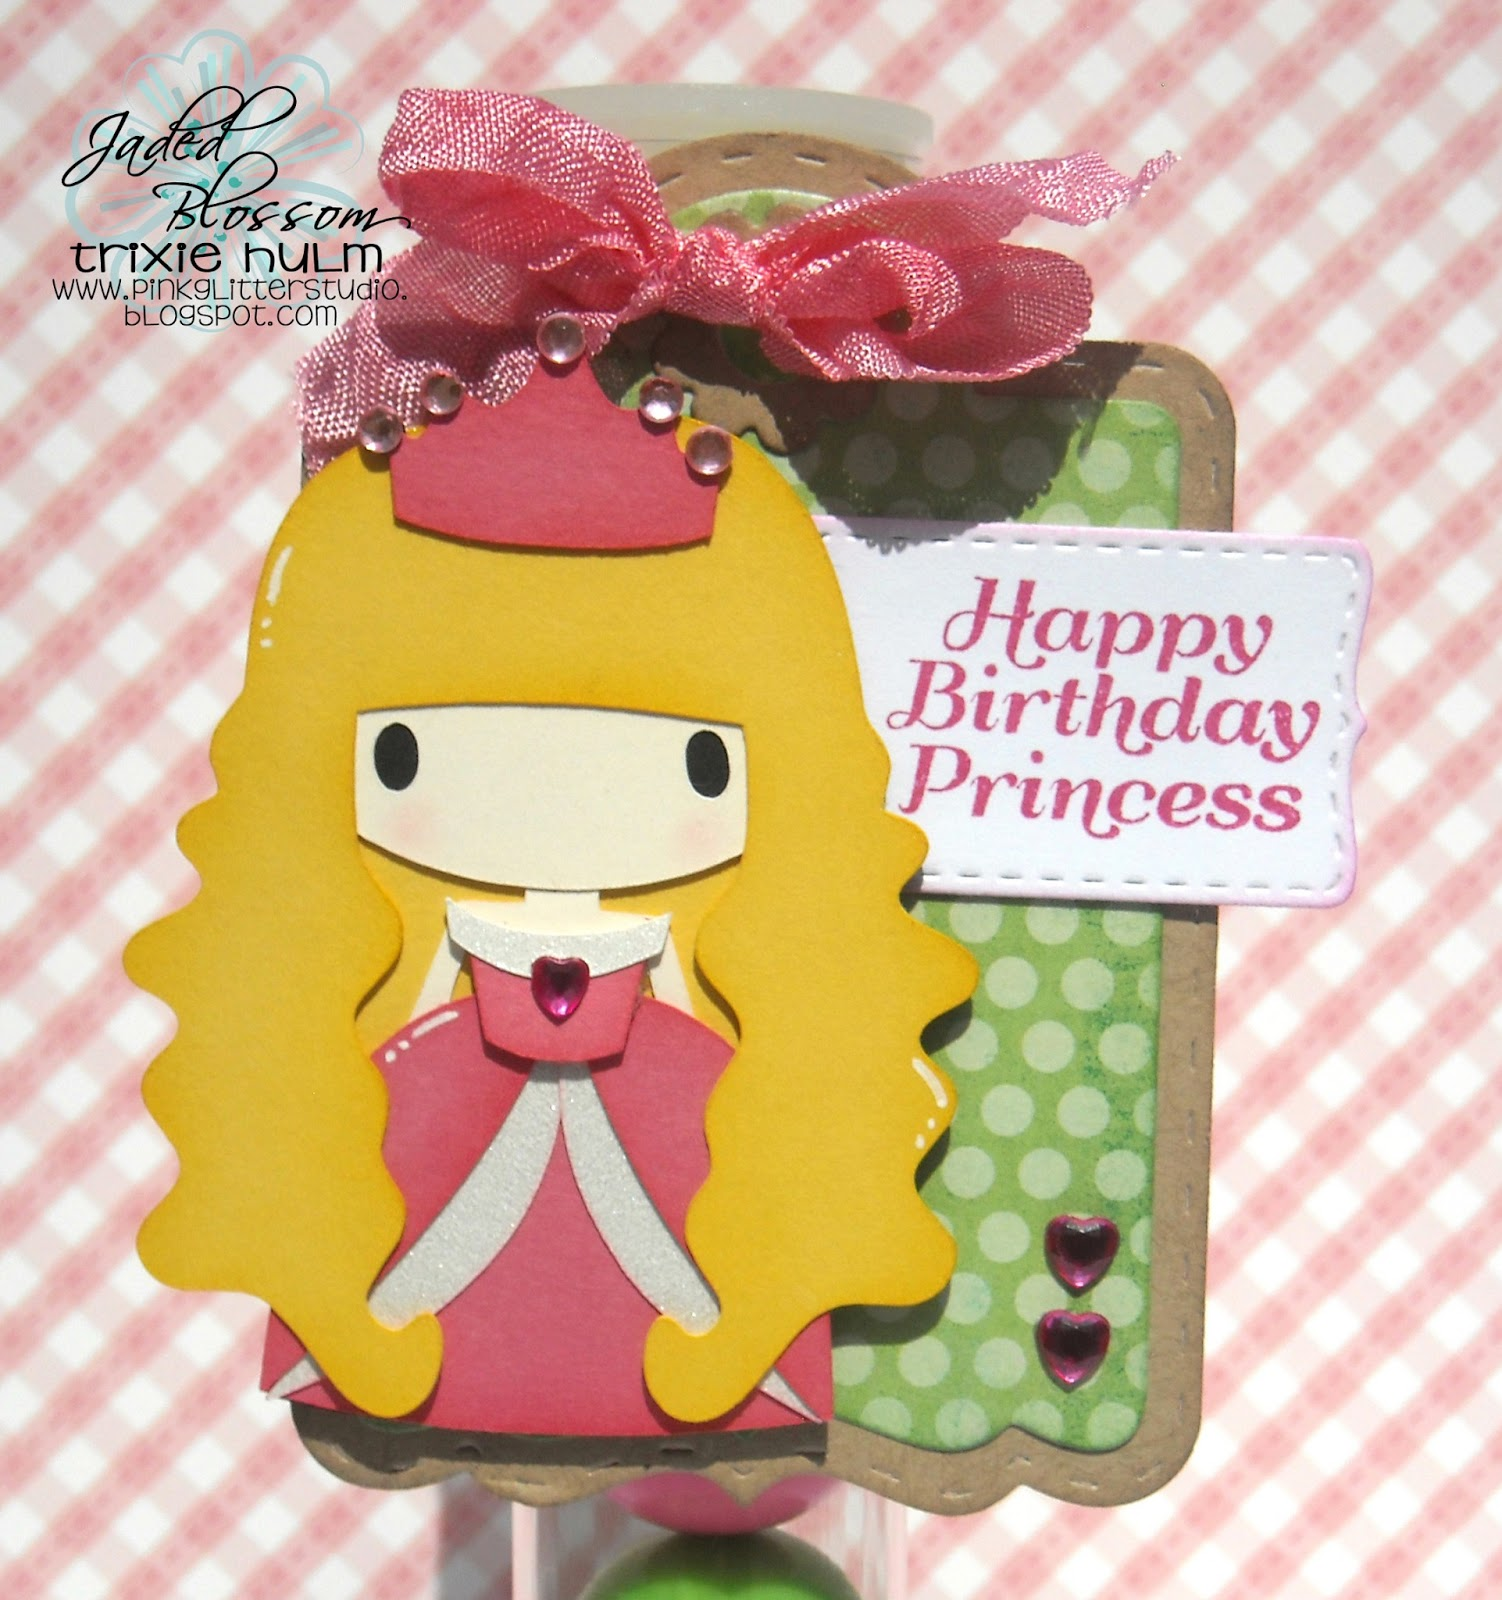 Pink Glitter Studio: Happy Birthday Princess